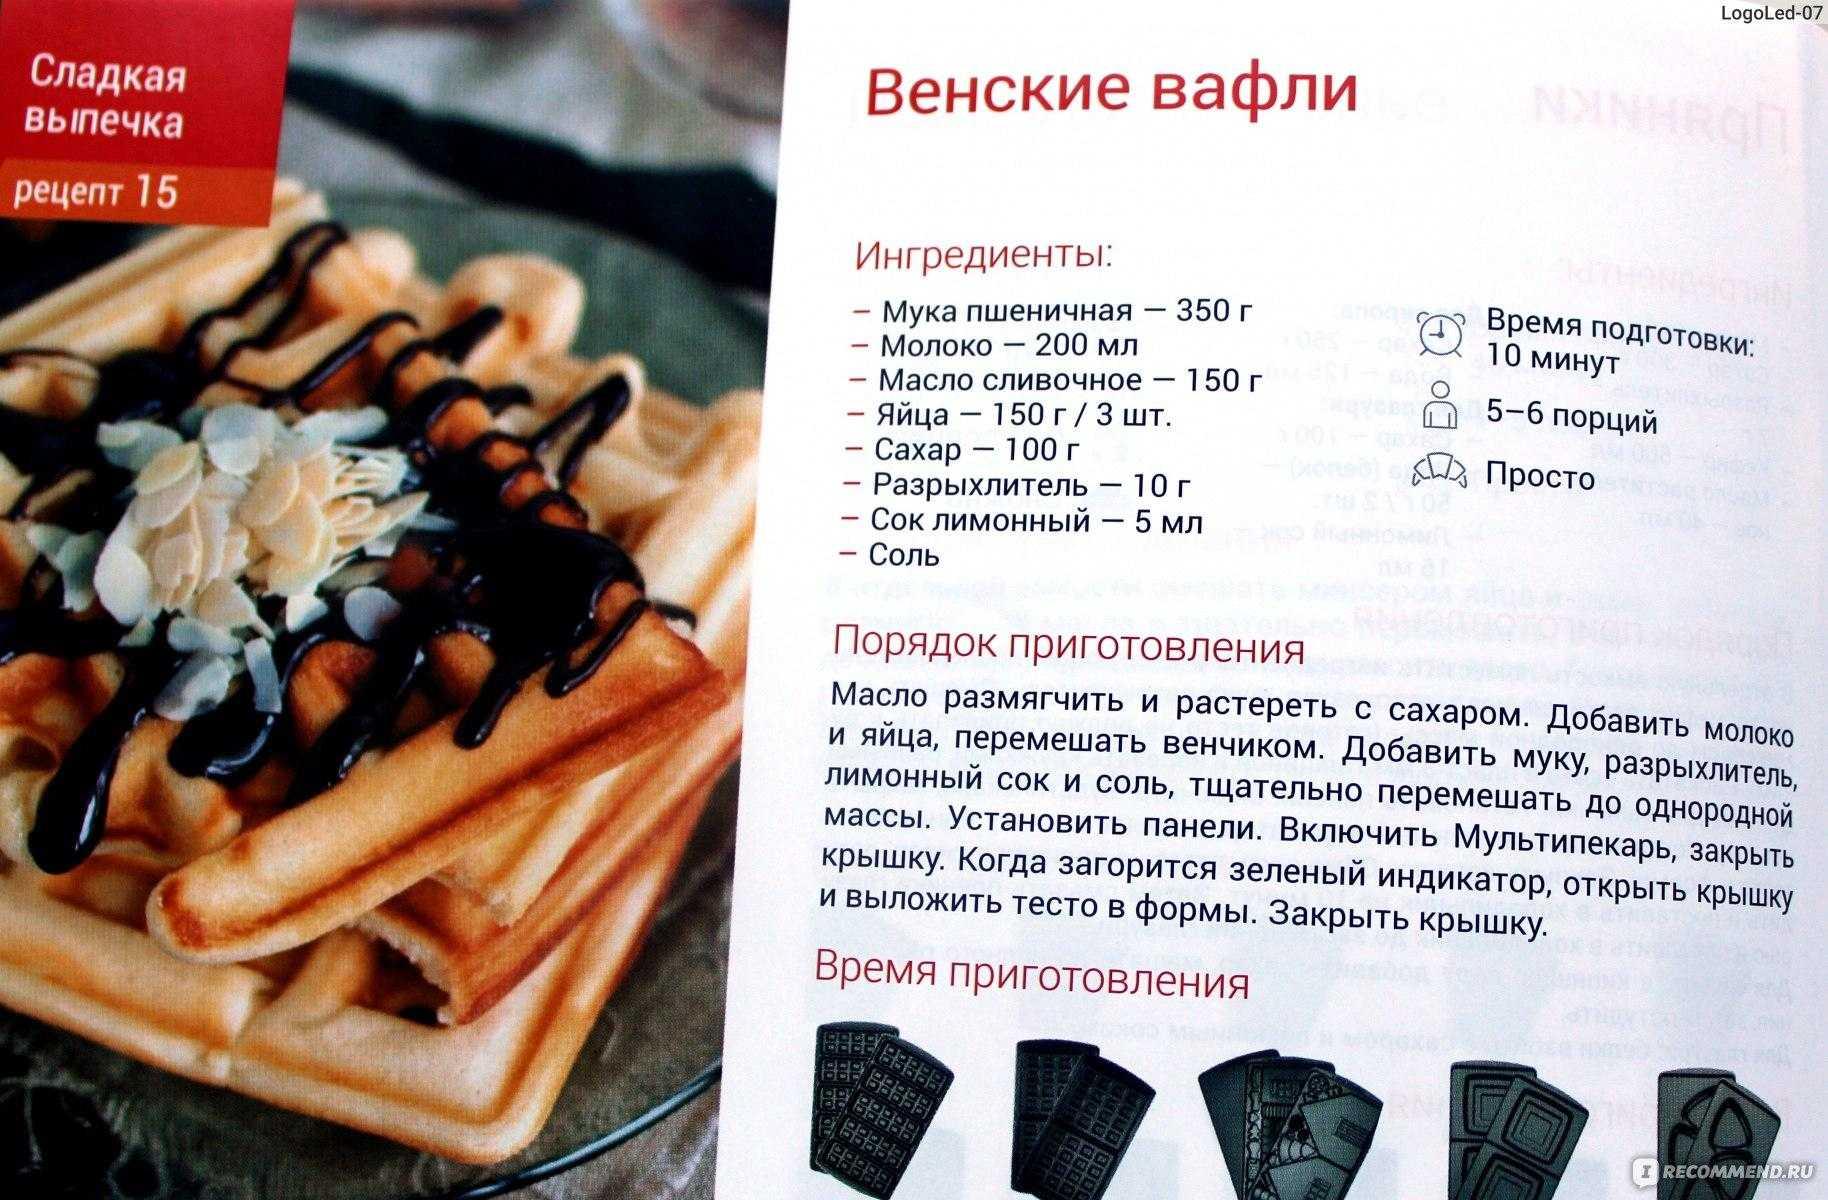 Вафли - рецепты